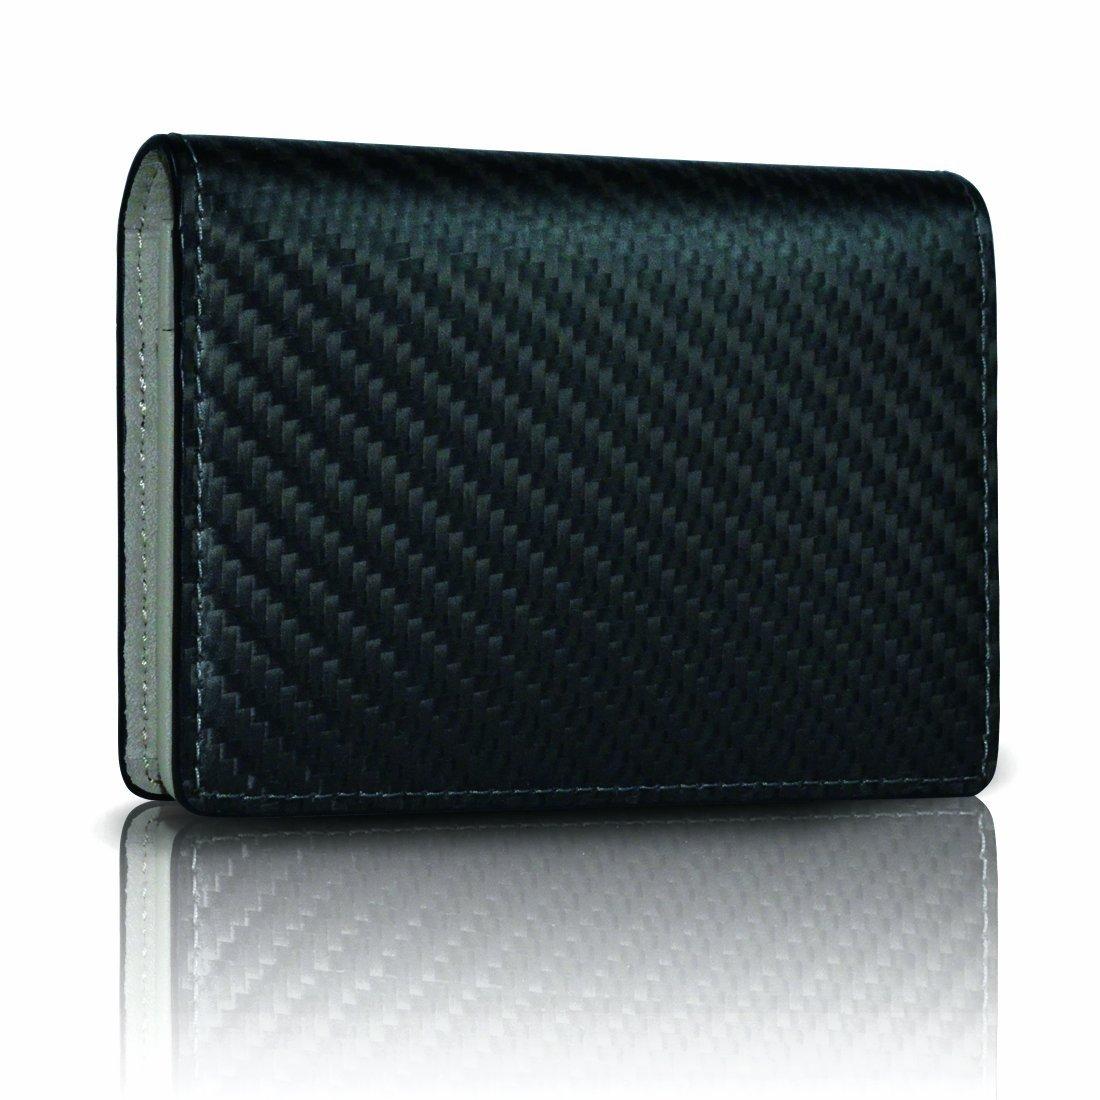 monCarbone Passport Holder Cover Carbon Fiber Leather Travel Wallet for Men /& Women